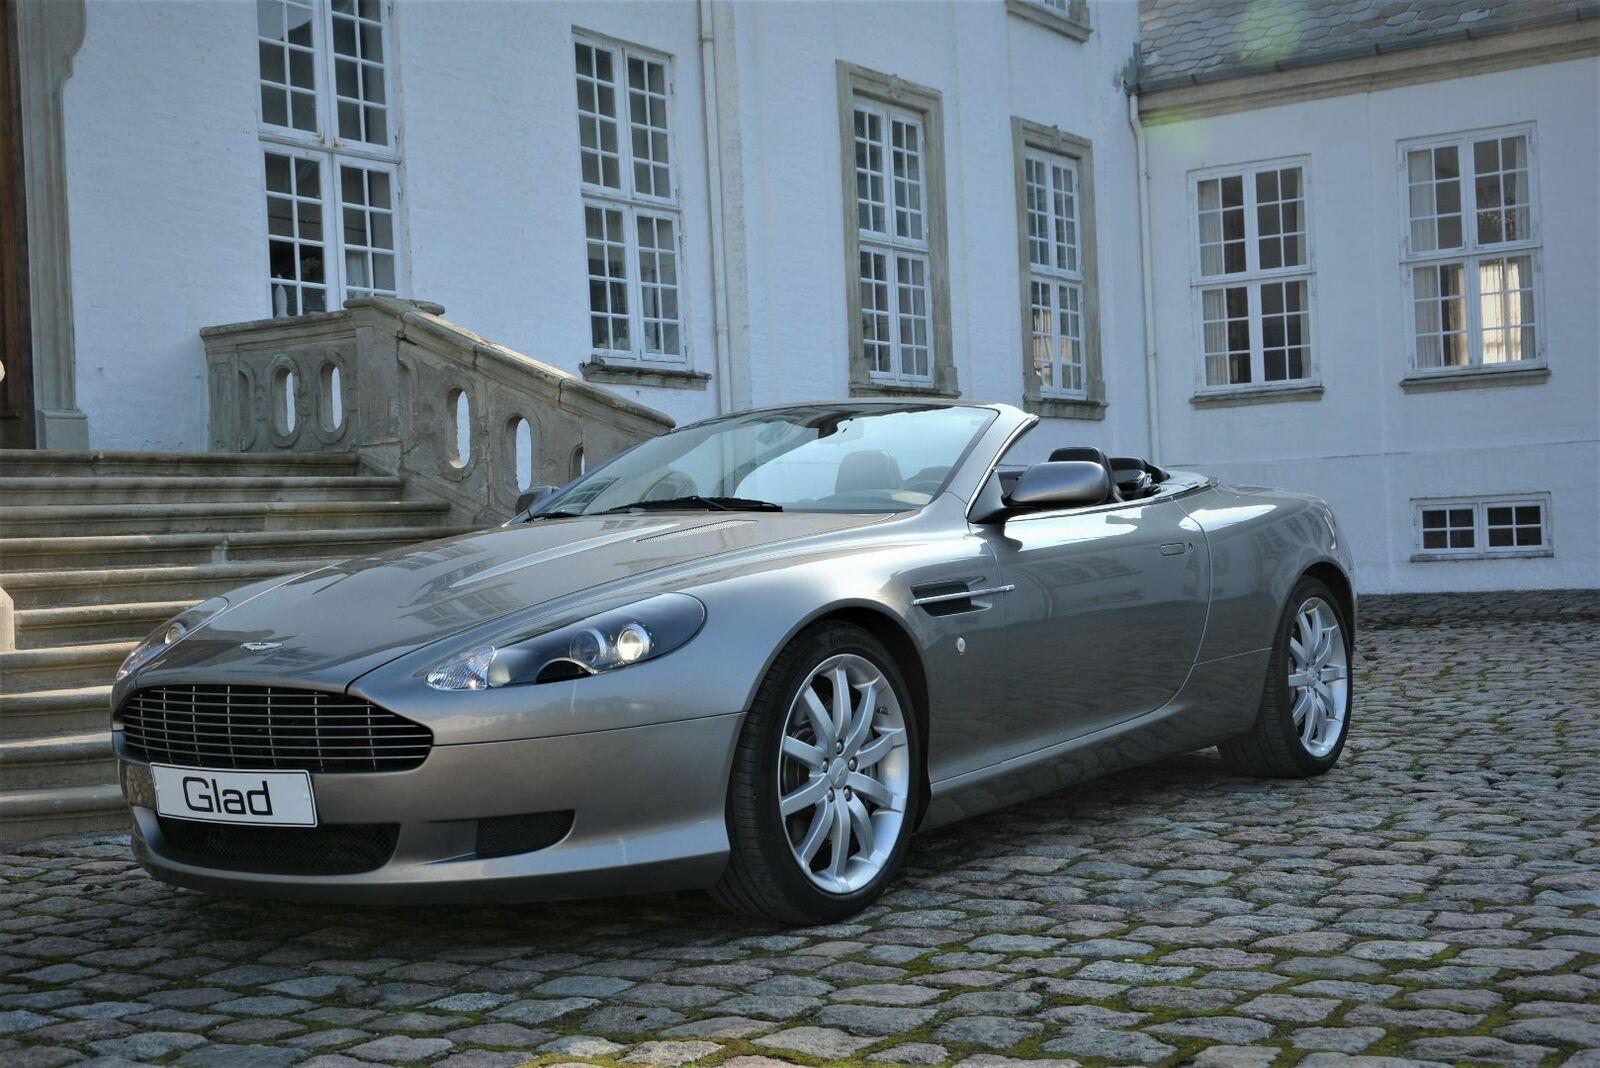 Aston Martin DB9 6,0 Volante aut. 2d - 425.000 kr.